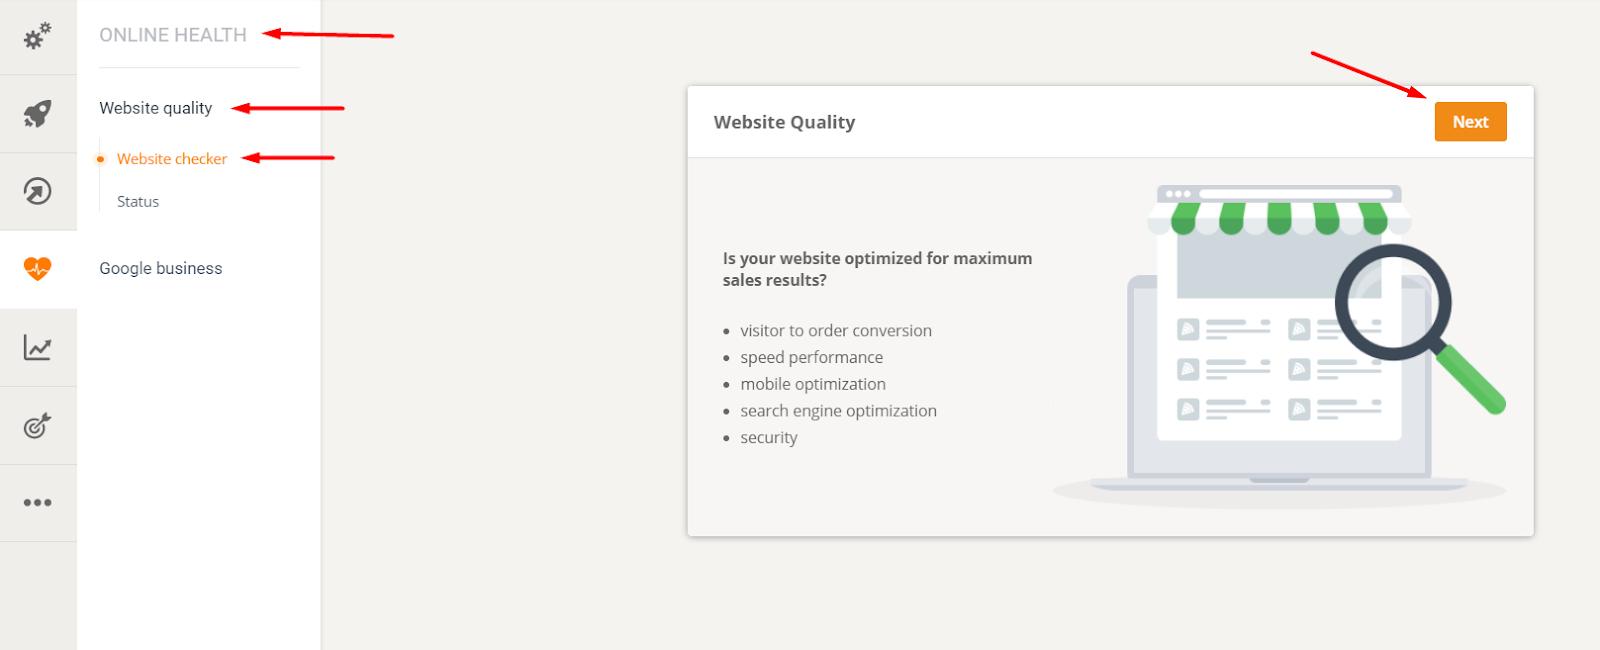 restaurant key success factors - website quality